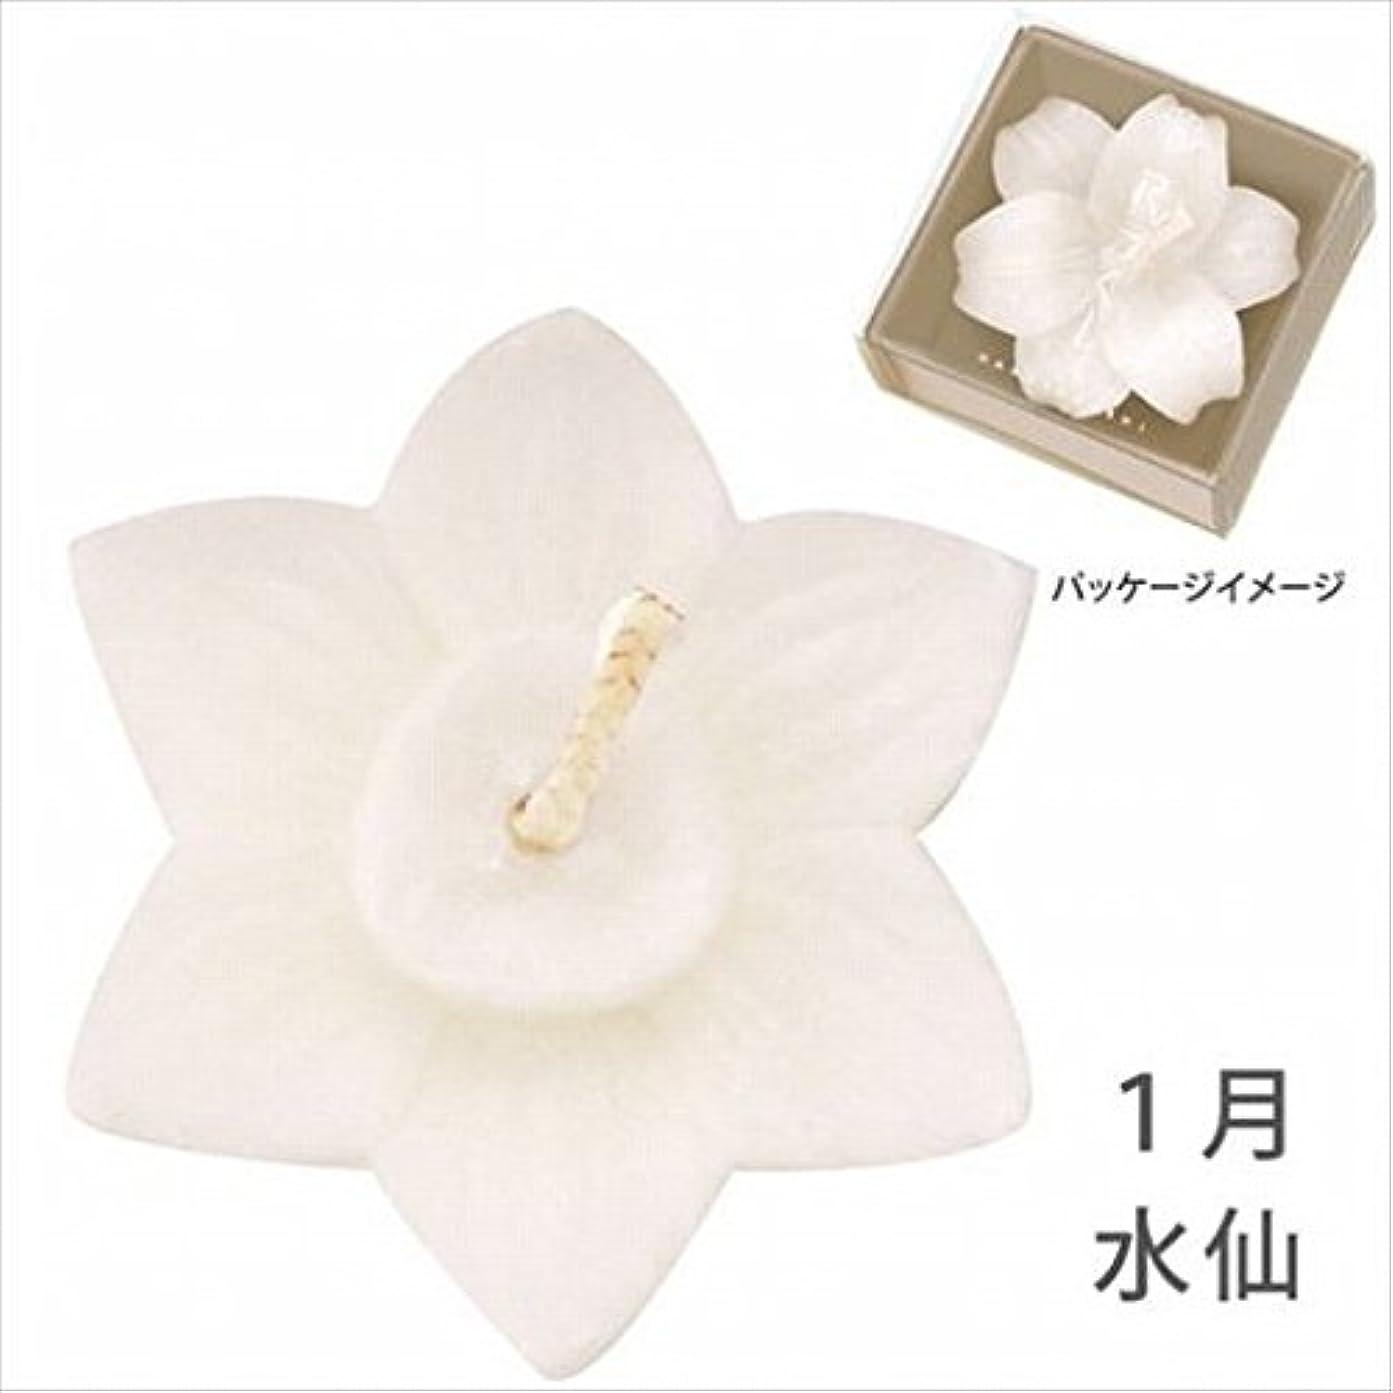 kameyama candle(カメヤマキャンドル) 花づくし(植物性) 水仙 「 水仙(1月) 」 キャンドル(A4620530)